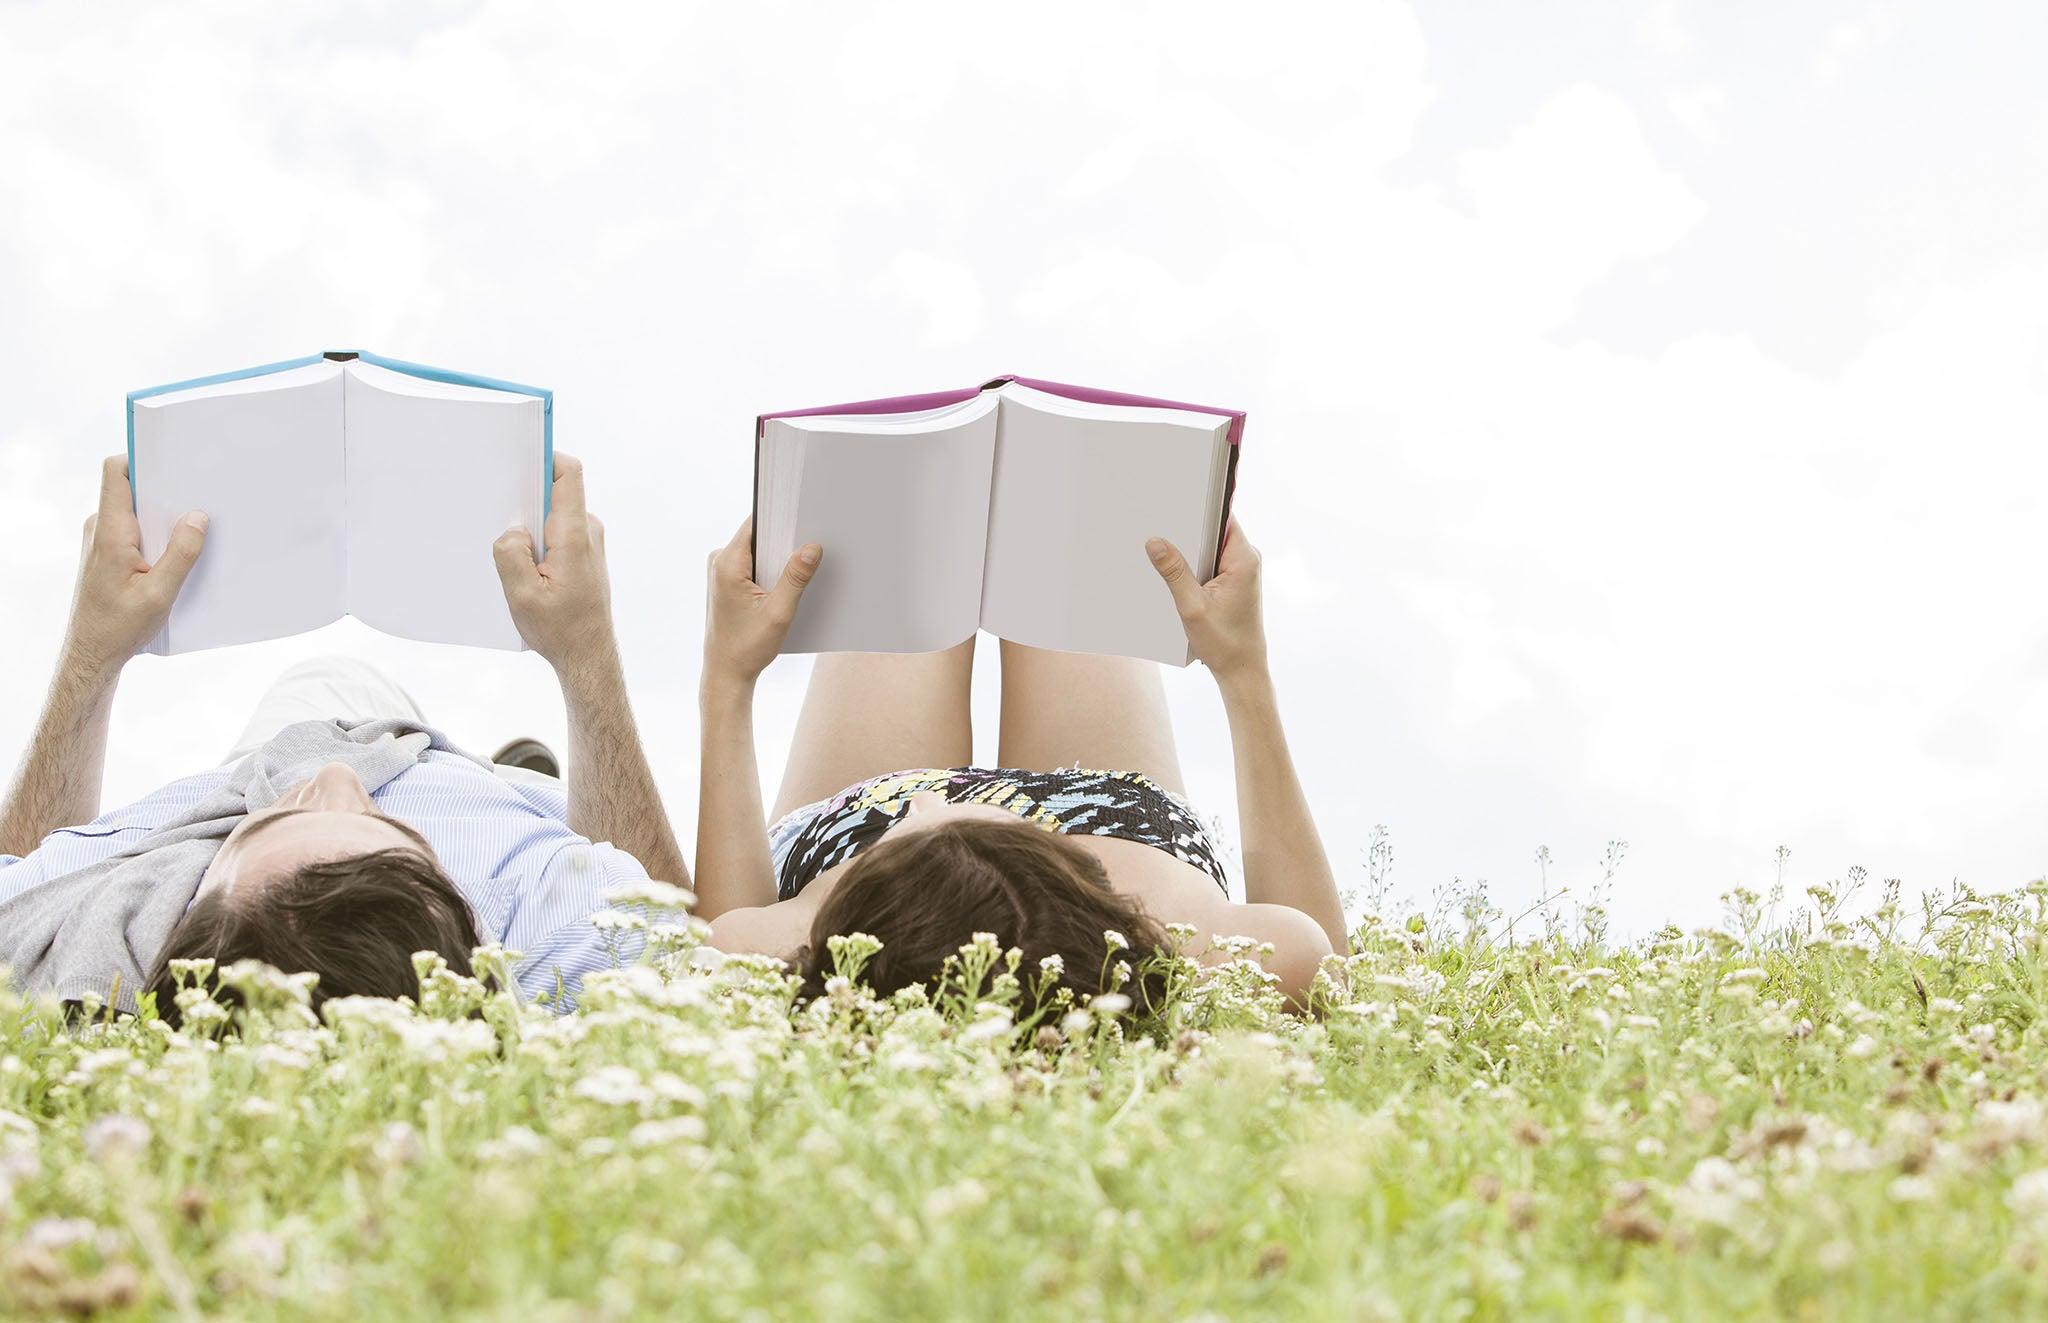 The best summer reads: 90 books chosen by 40 literary luminaries